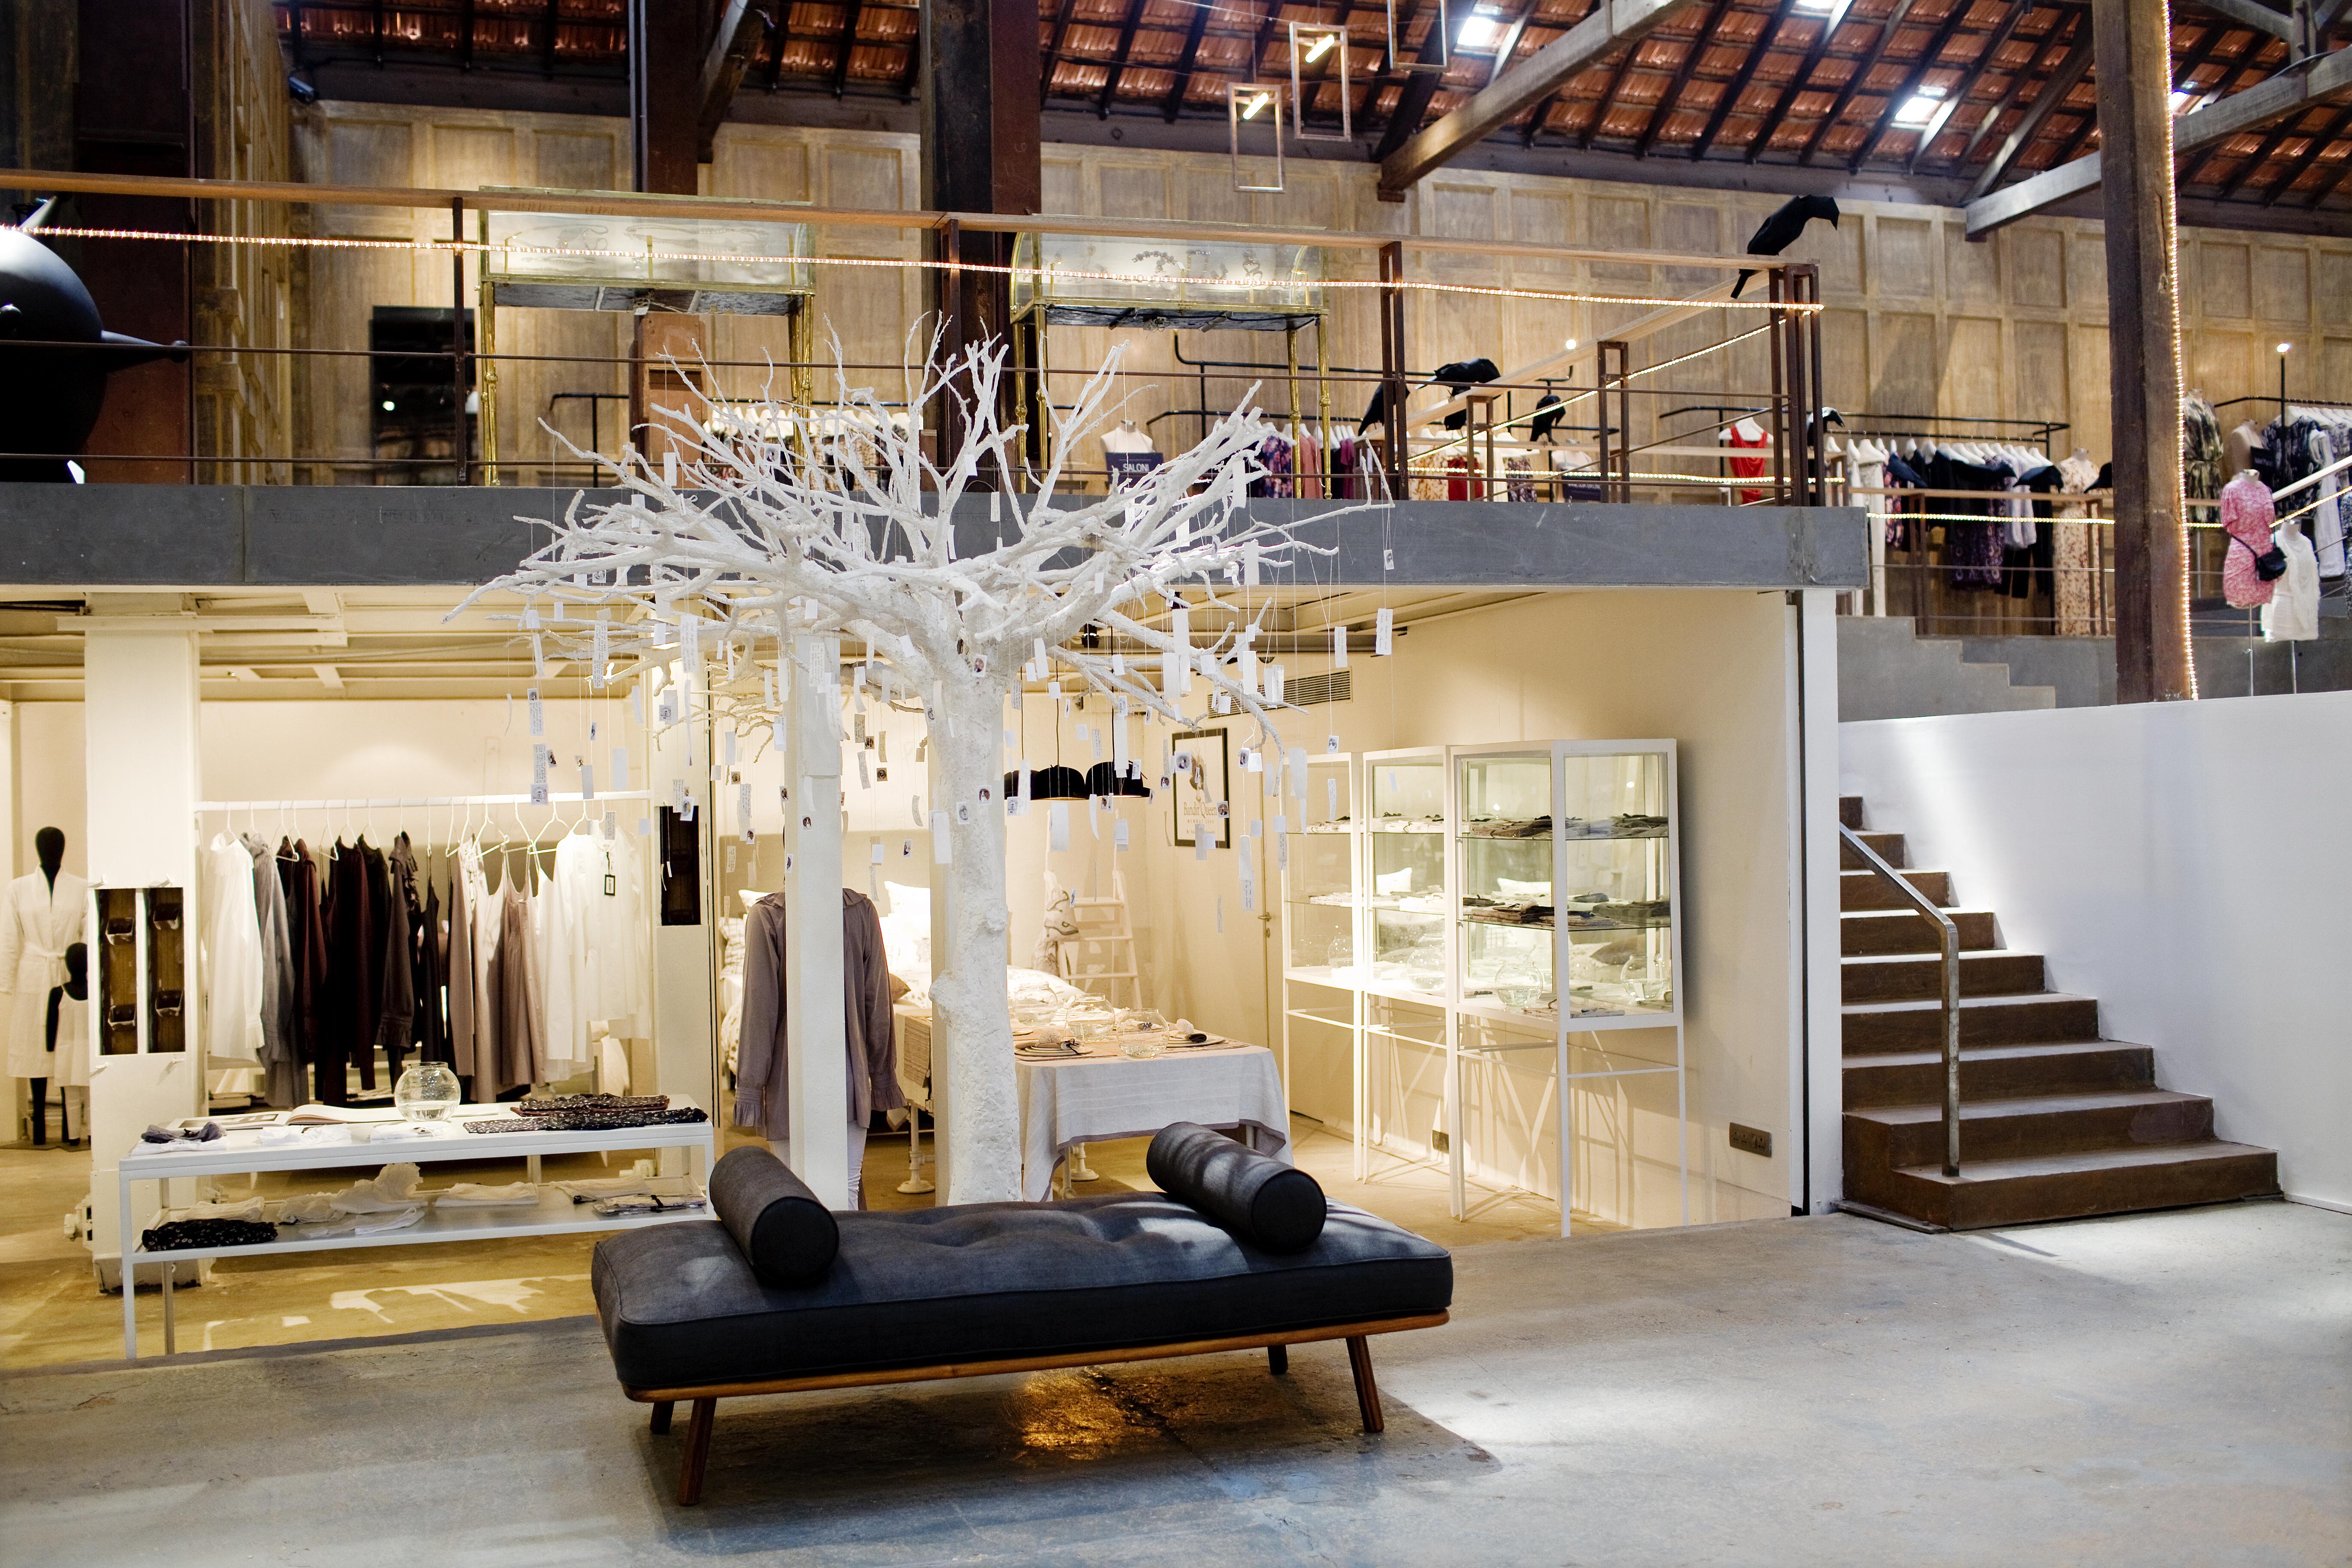 100 Mumbai Home Decor Stores Home Interior Online Shopping Home Design And Decor Shopping